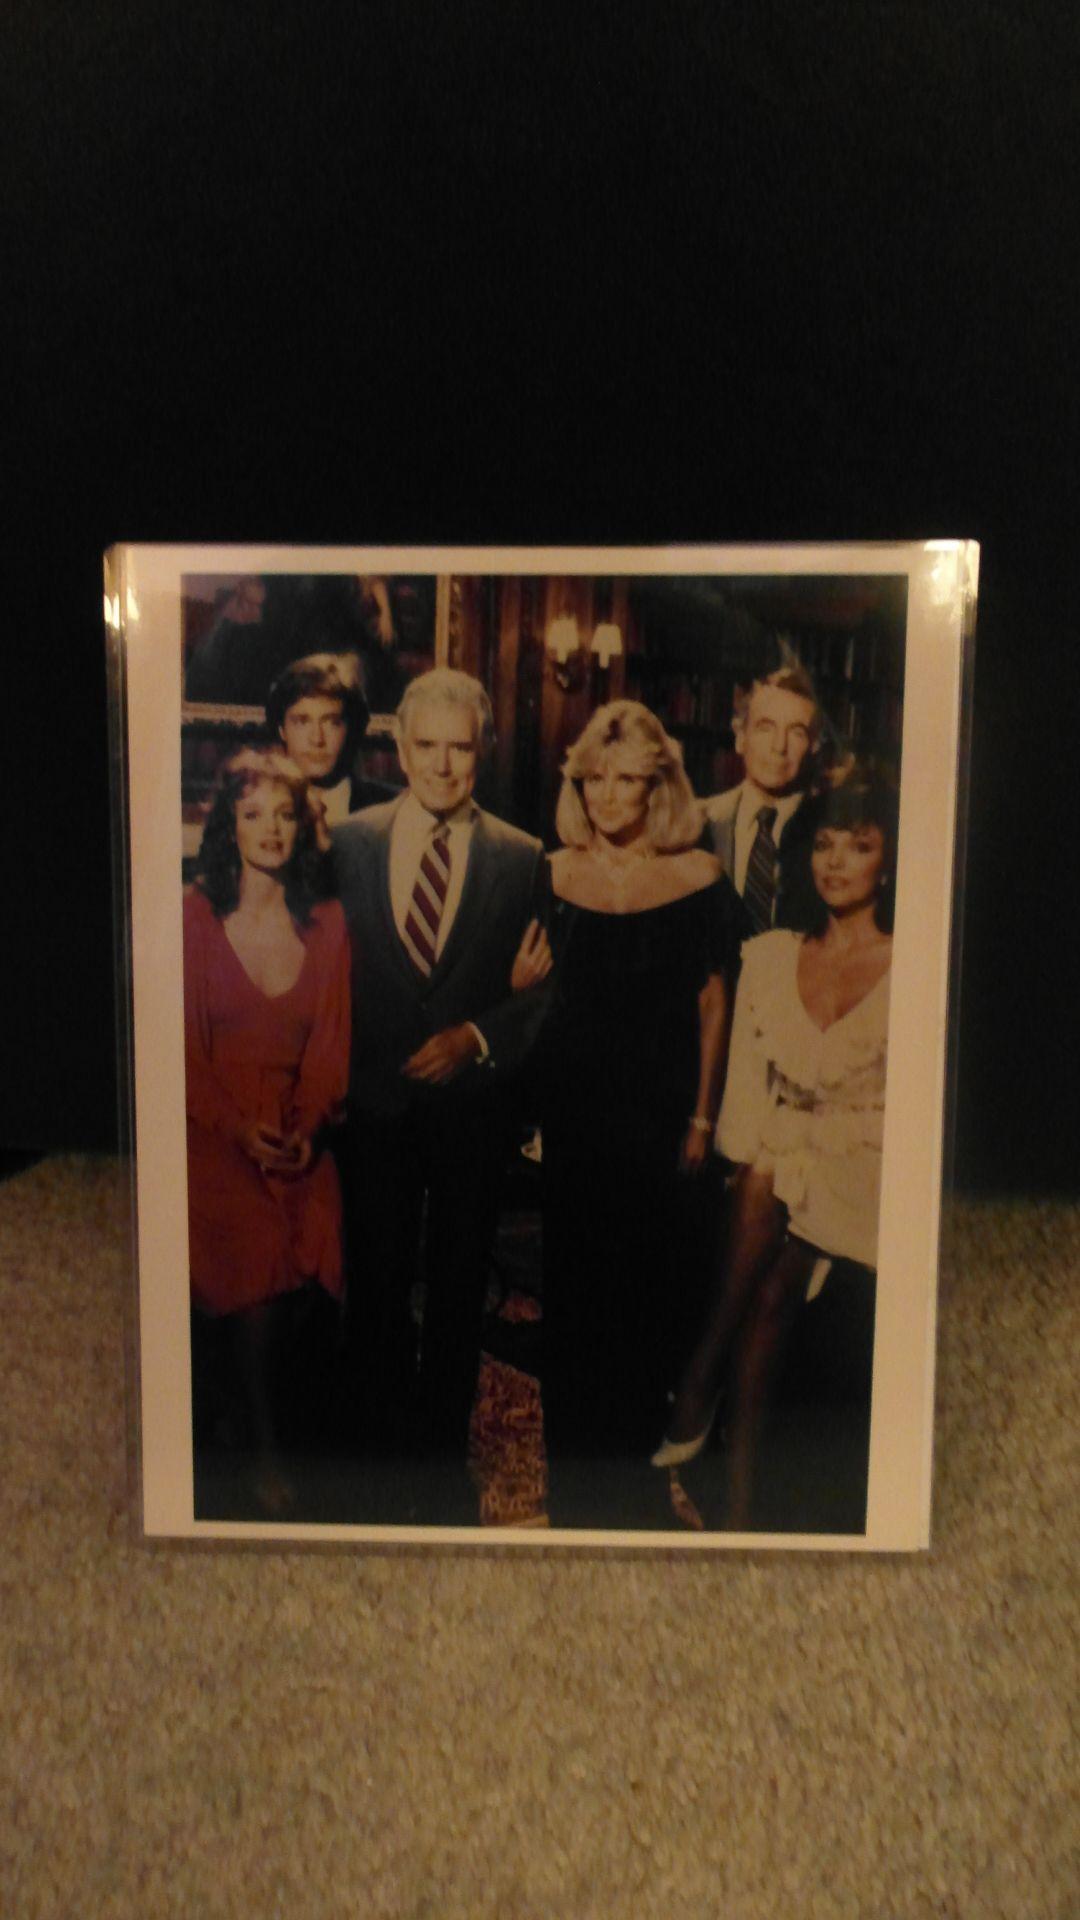 Dynasty season 2 cast photo (1982)